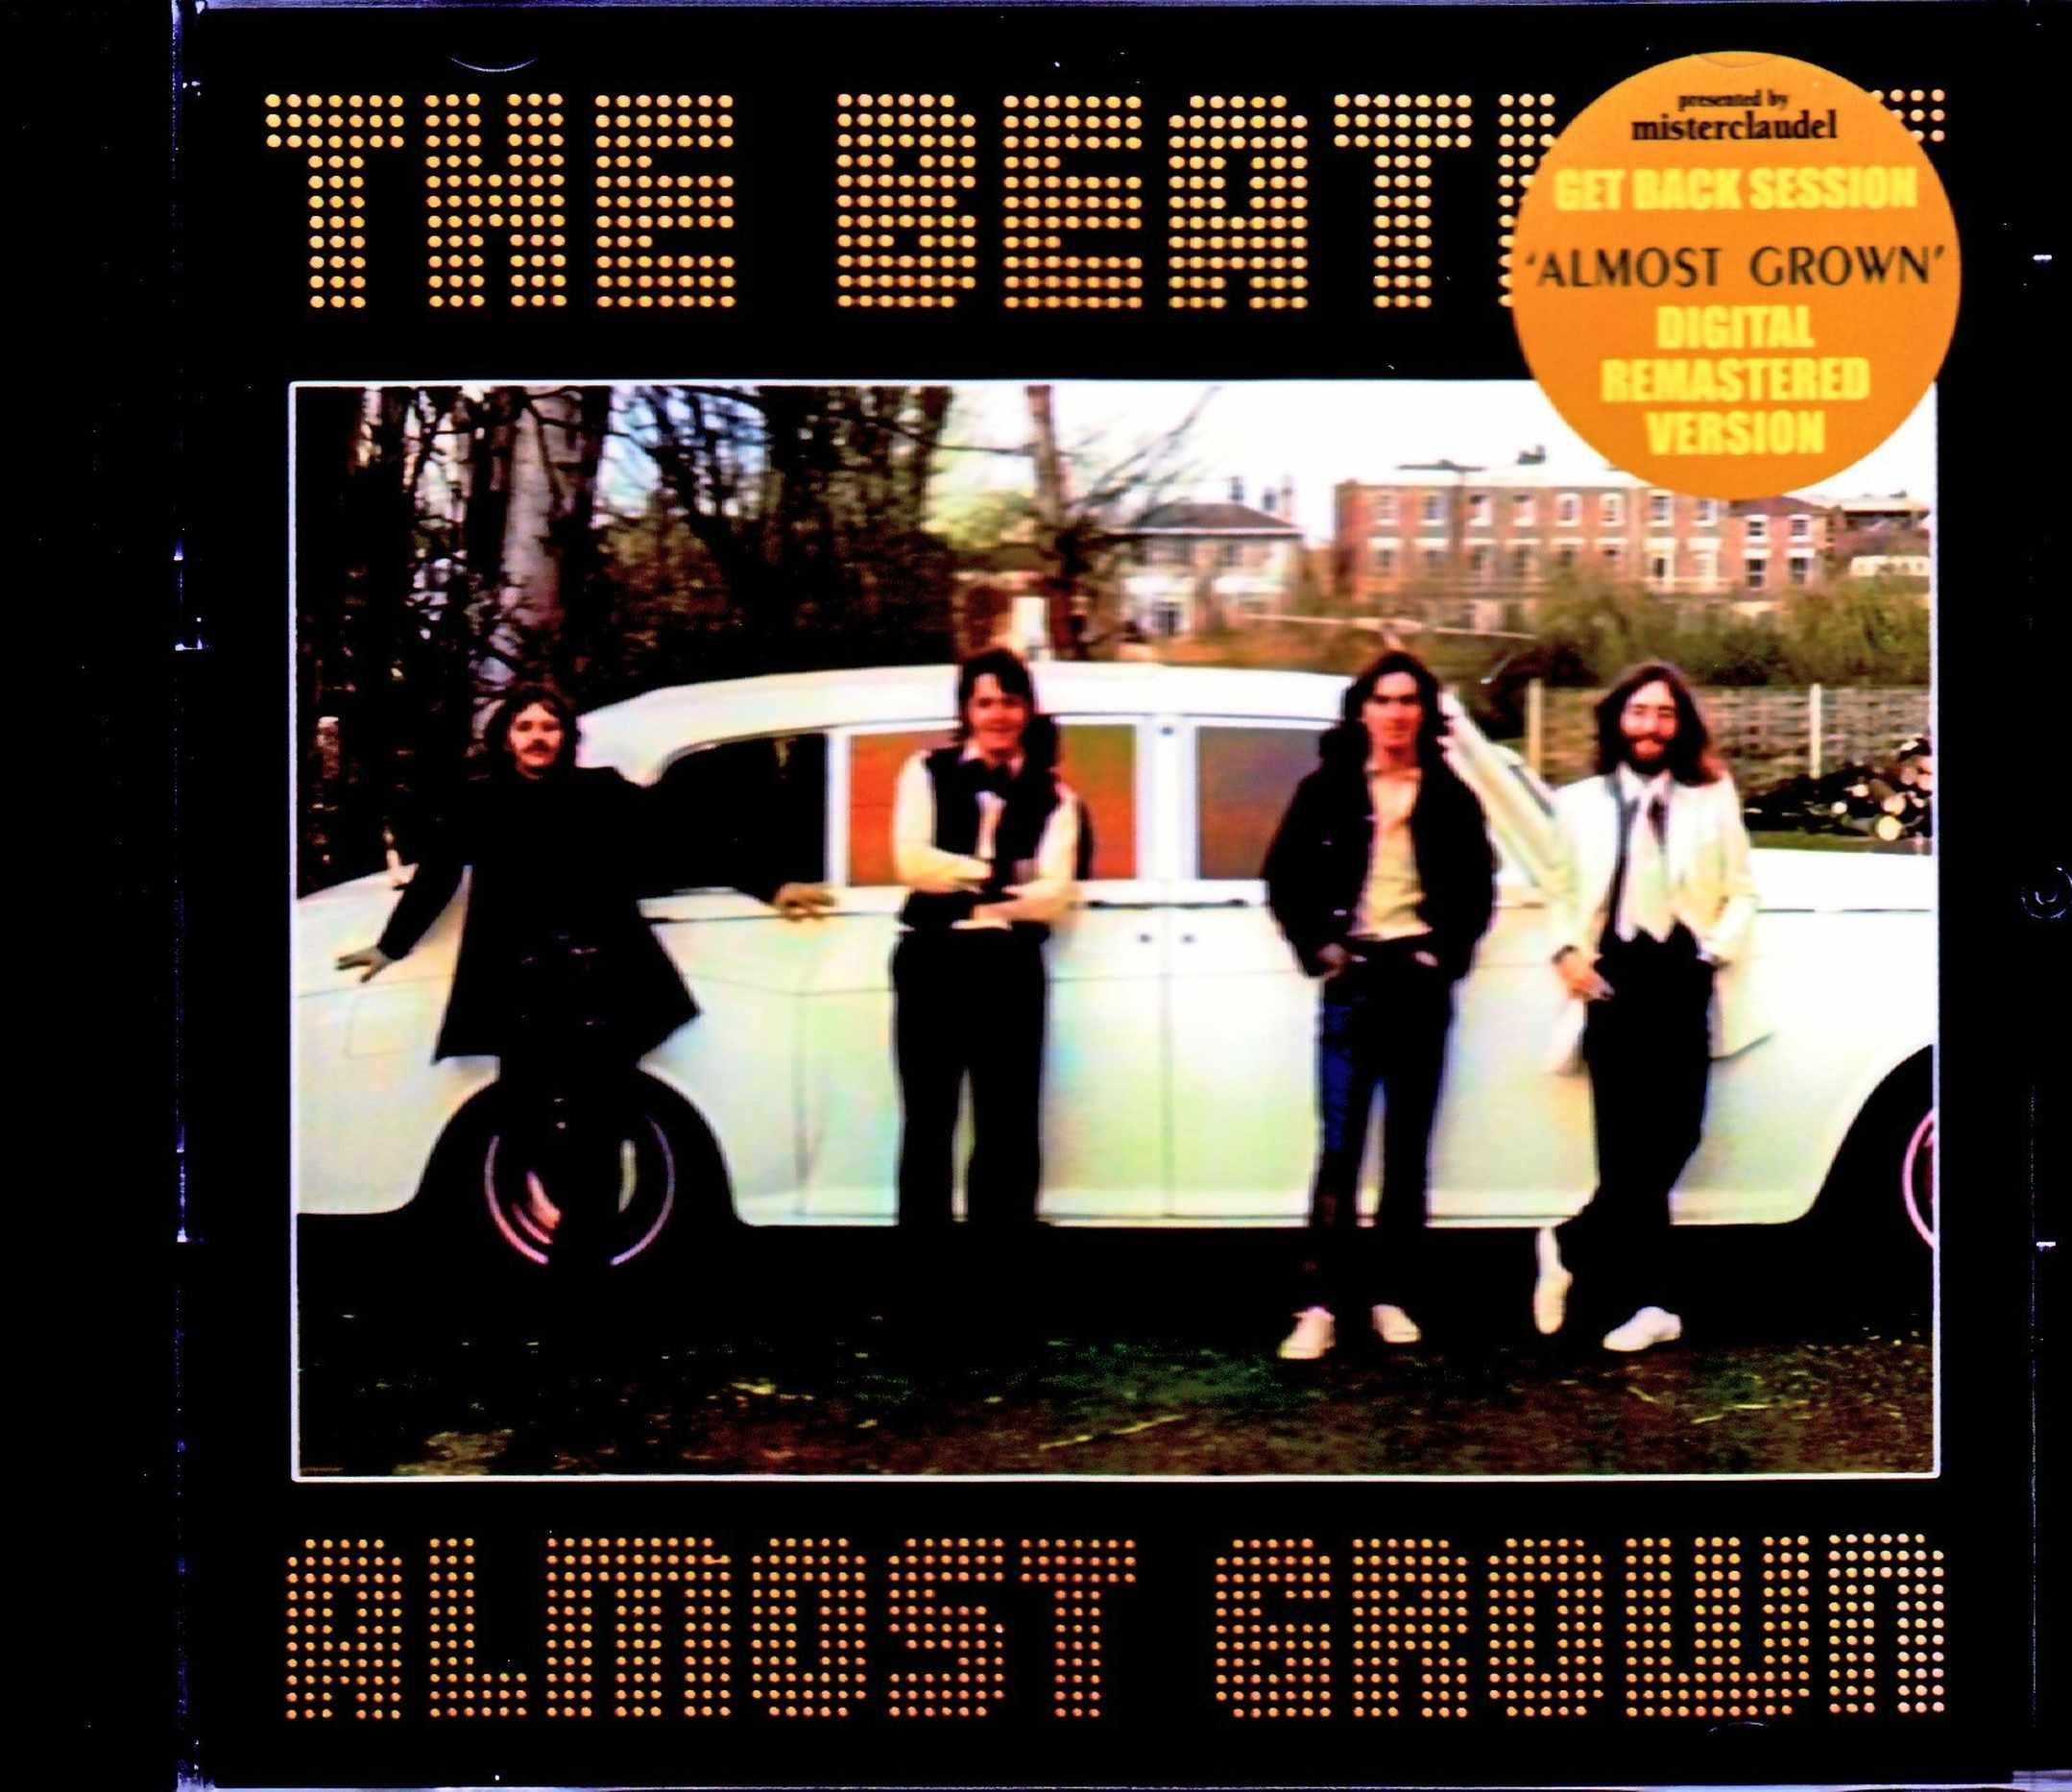 Beatles ビートルズ/ゲット・バック・セッション Get Back Session Almost Grown